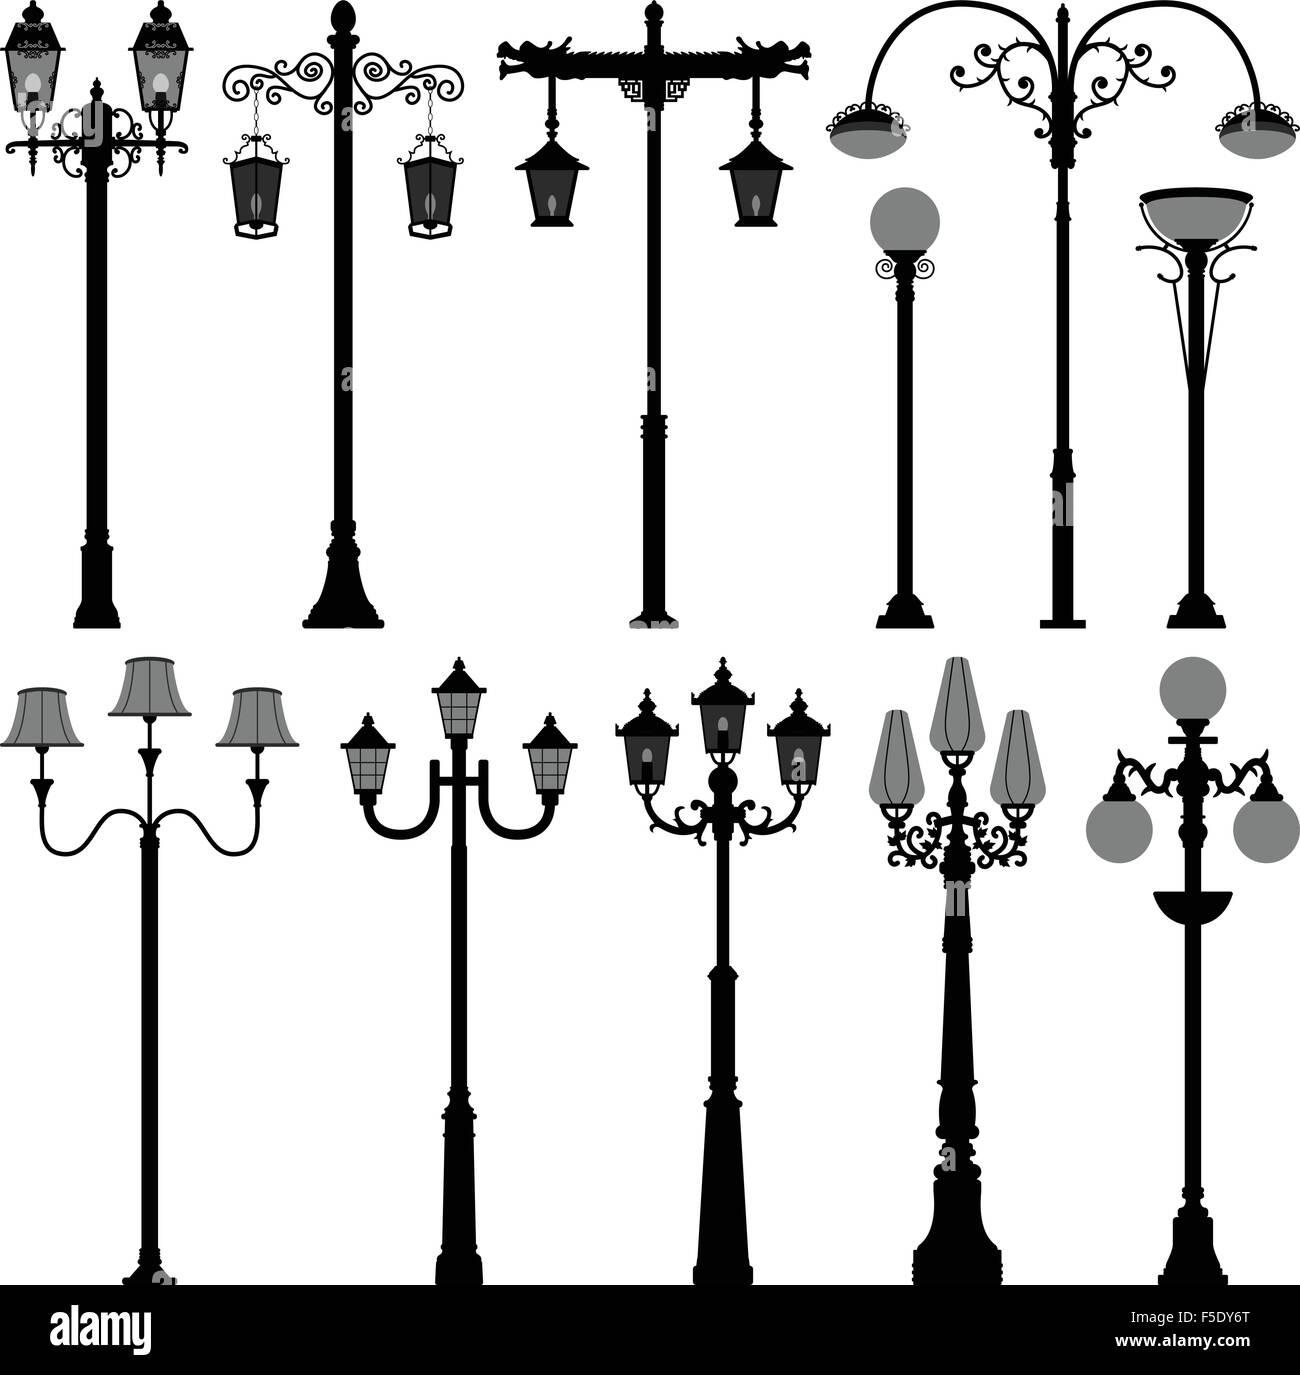 Lamp Post Lamppost Street Pole Light Stock Vector Art Illustration